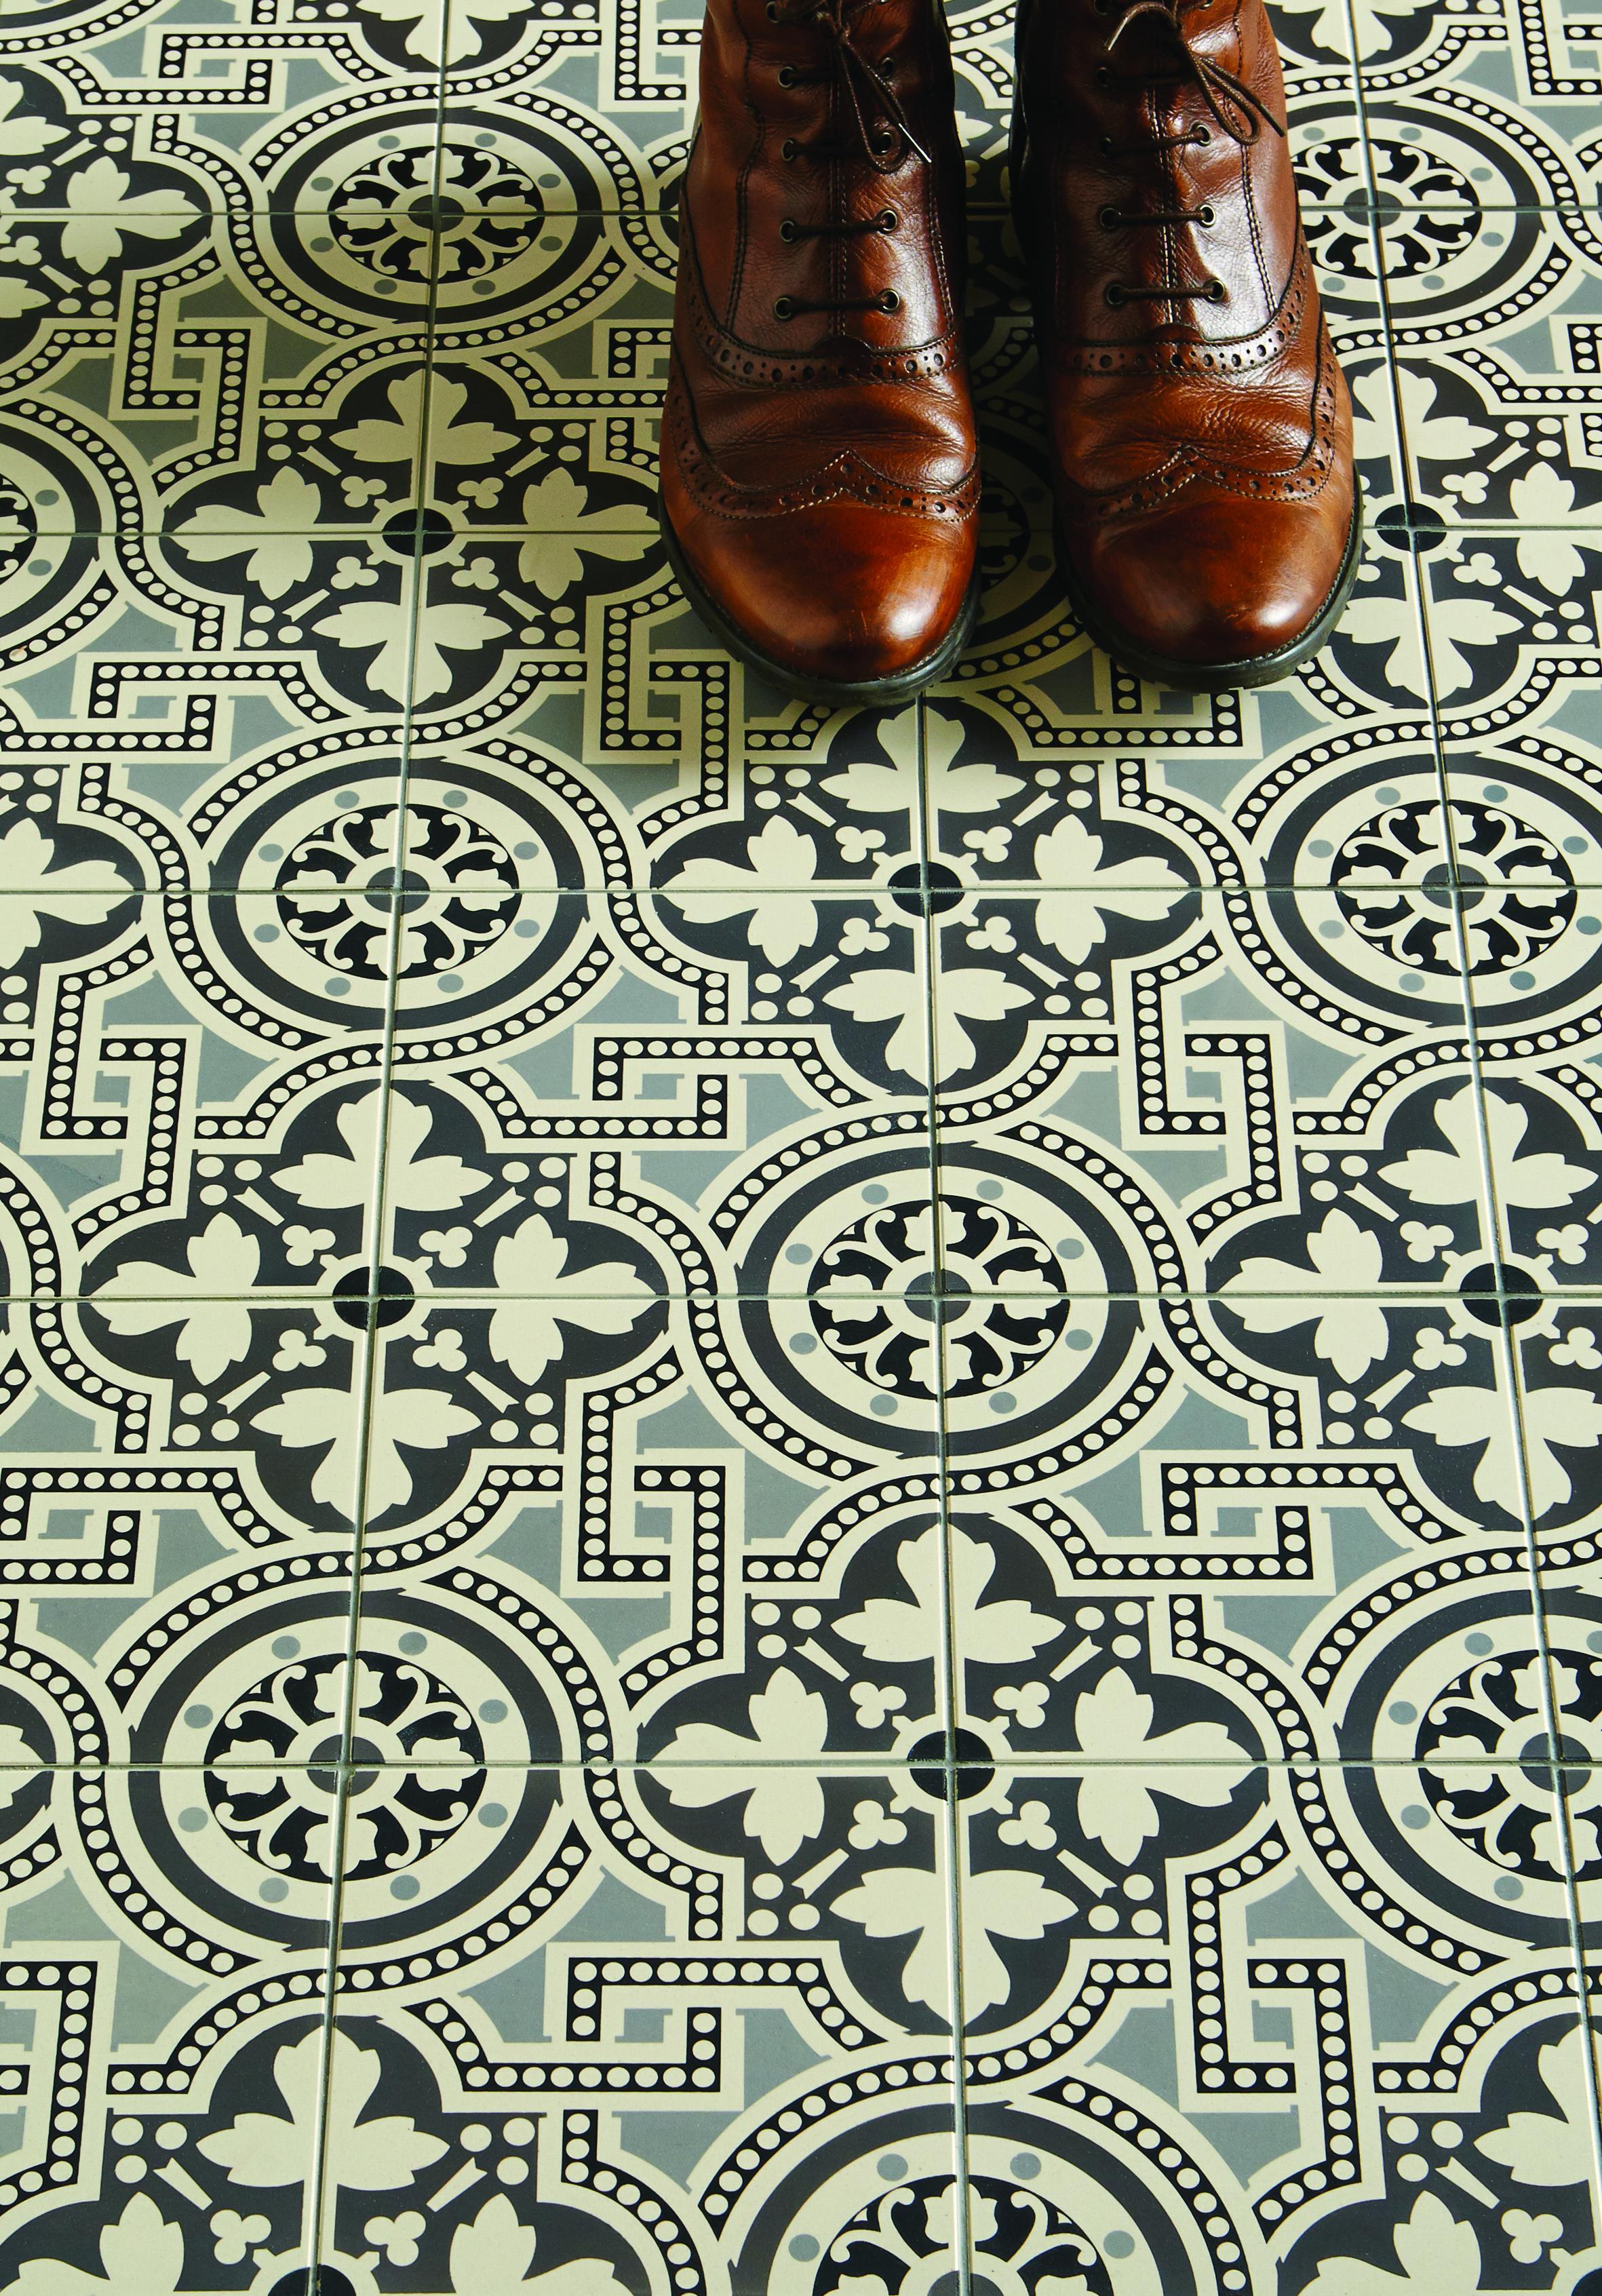 The Salisbury pattern tile in a newmonochrome colourway